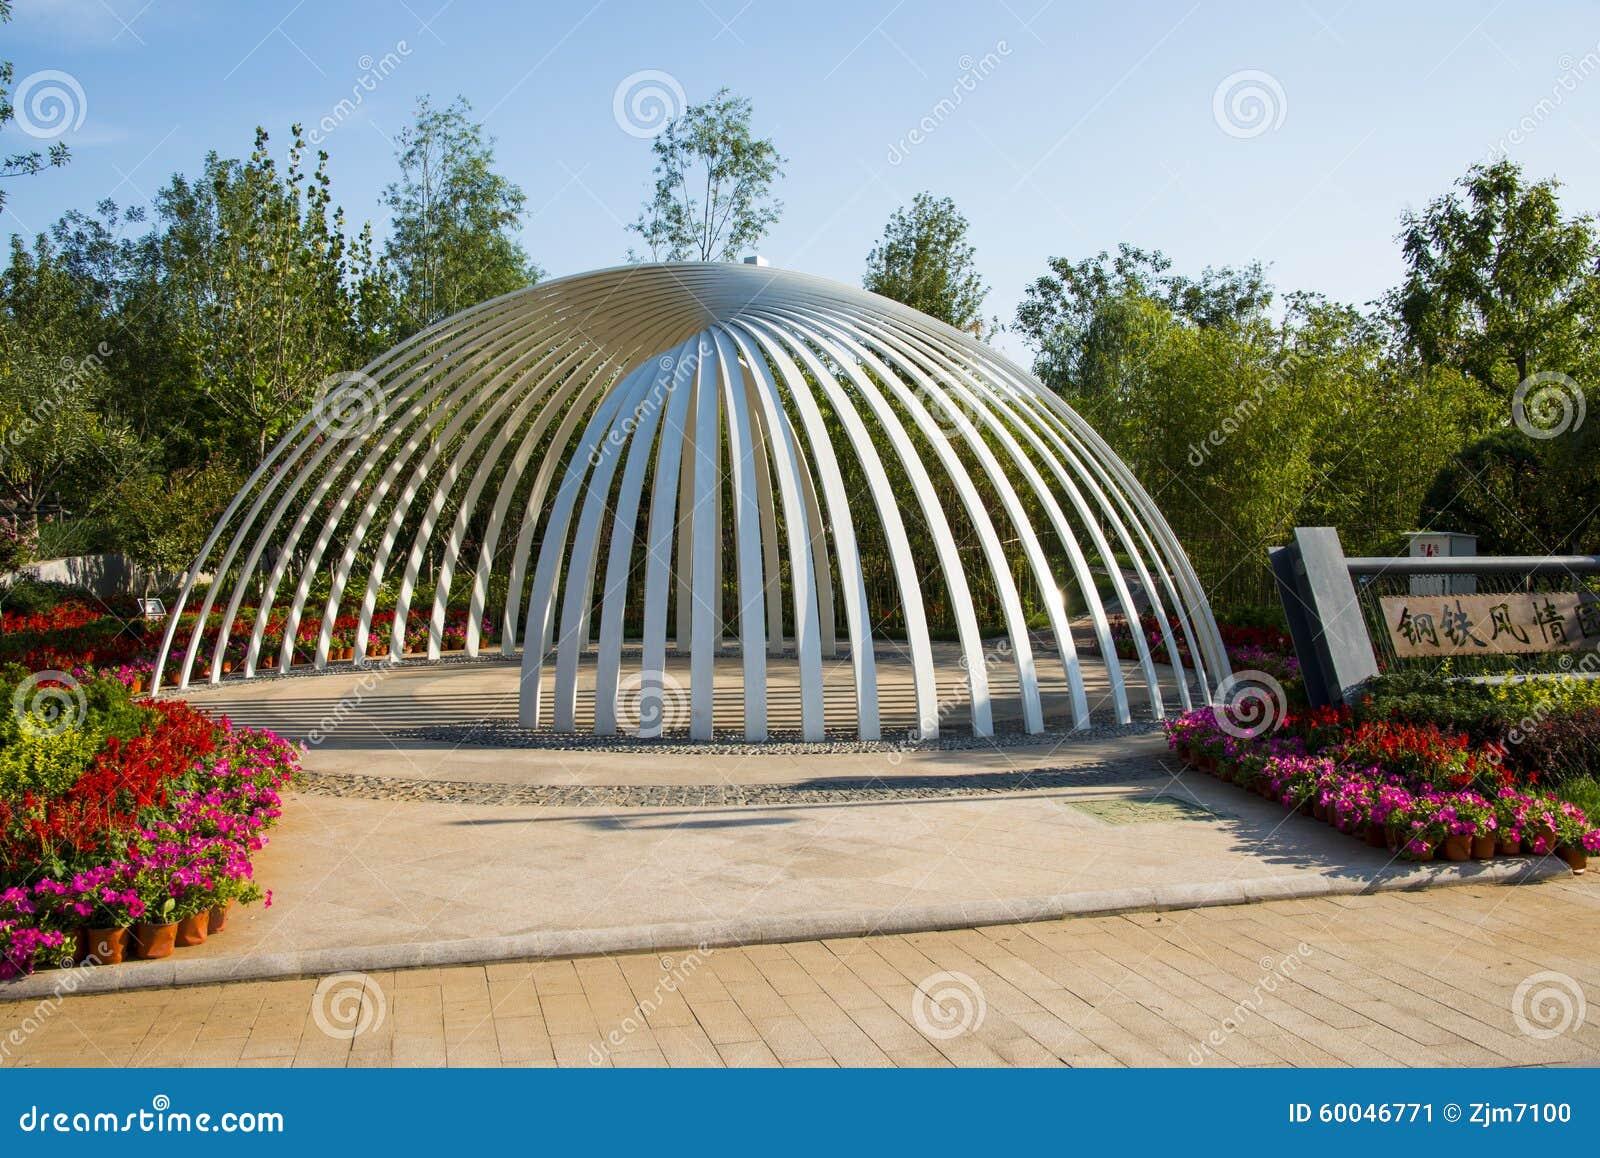 asia china wuqing tianjin green expo landscape architecture semi circle pavilion editorial